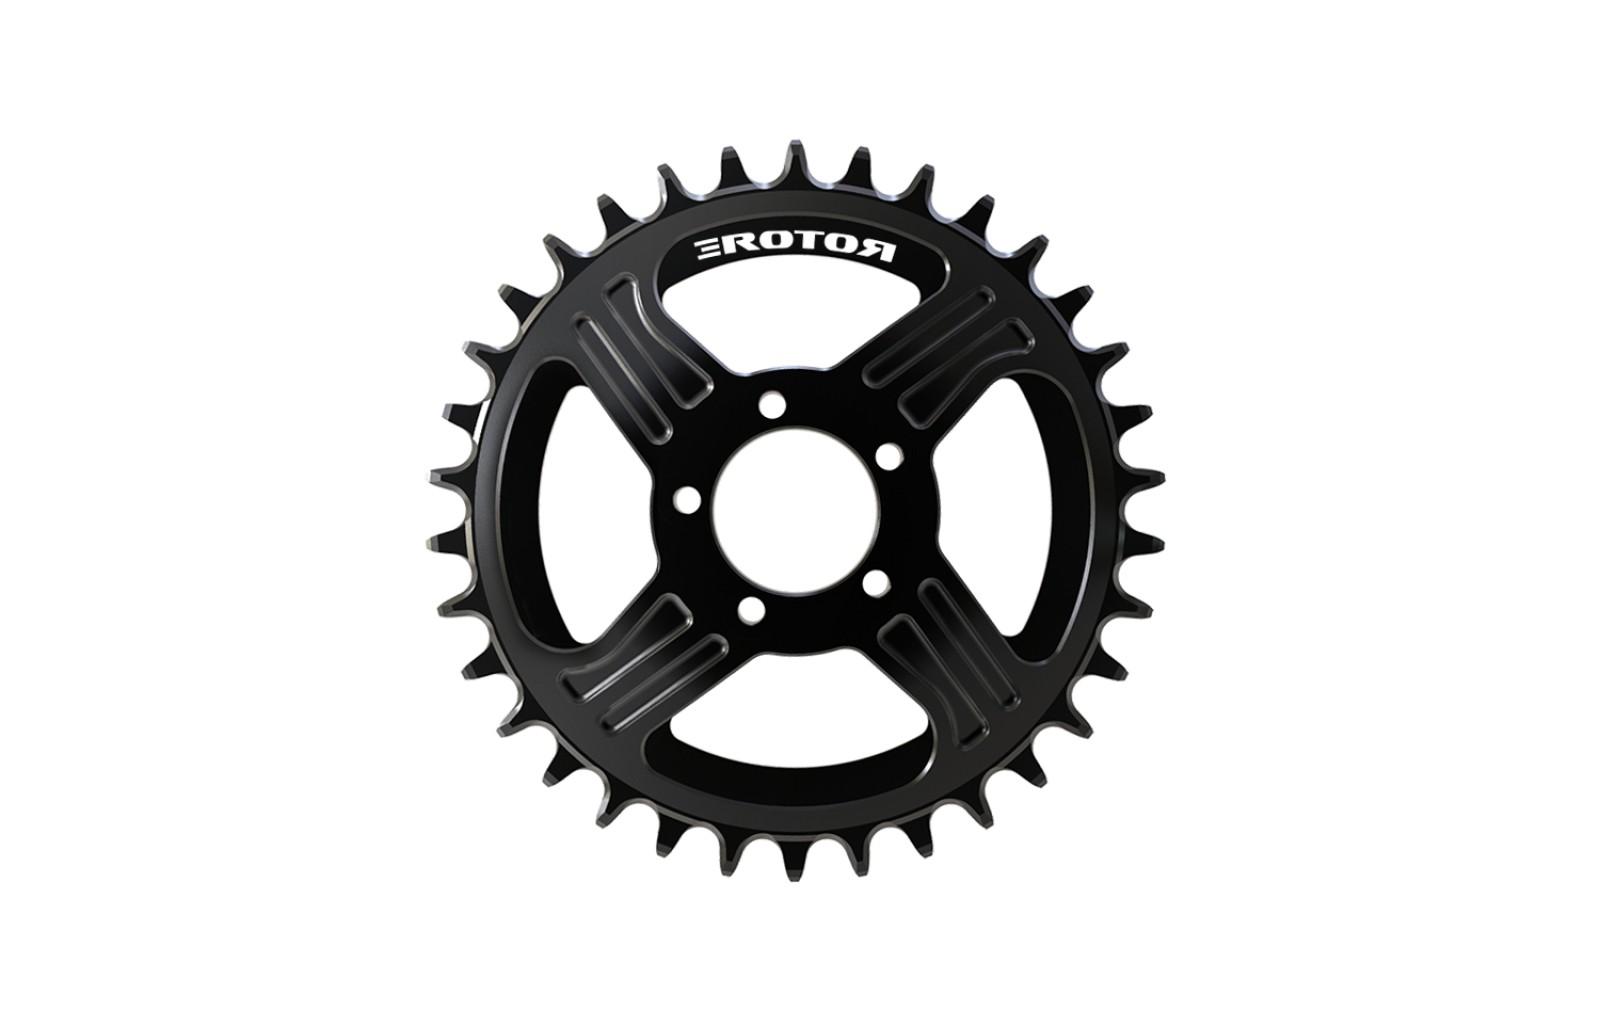 rotor-ekapic-2021/